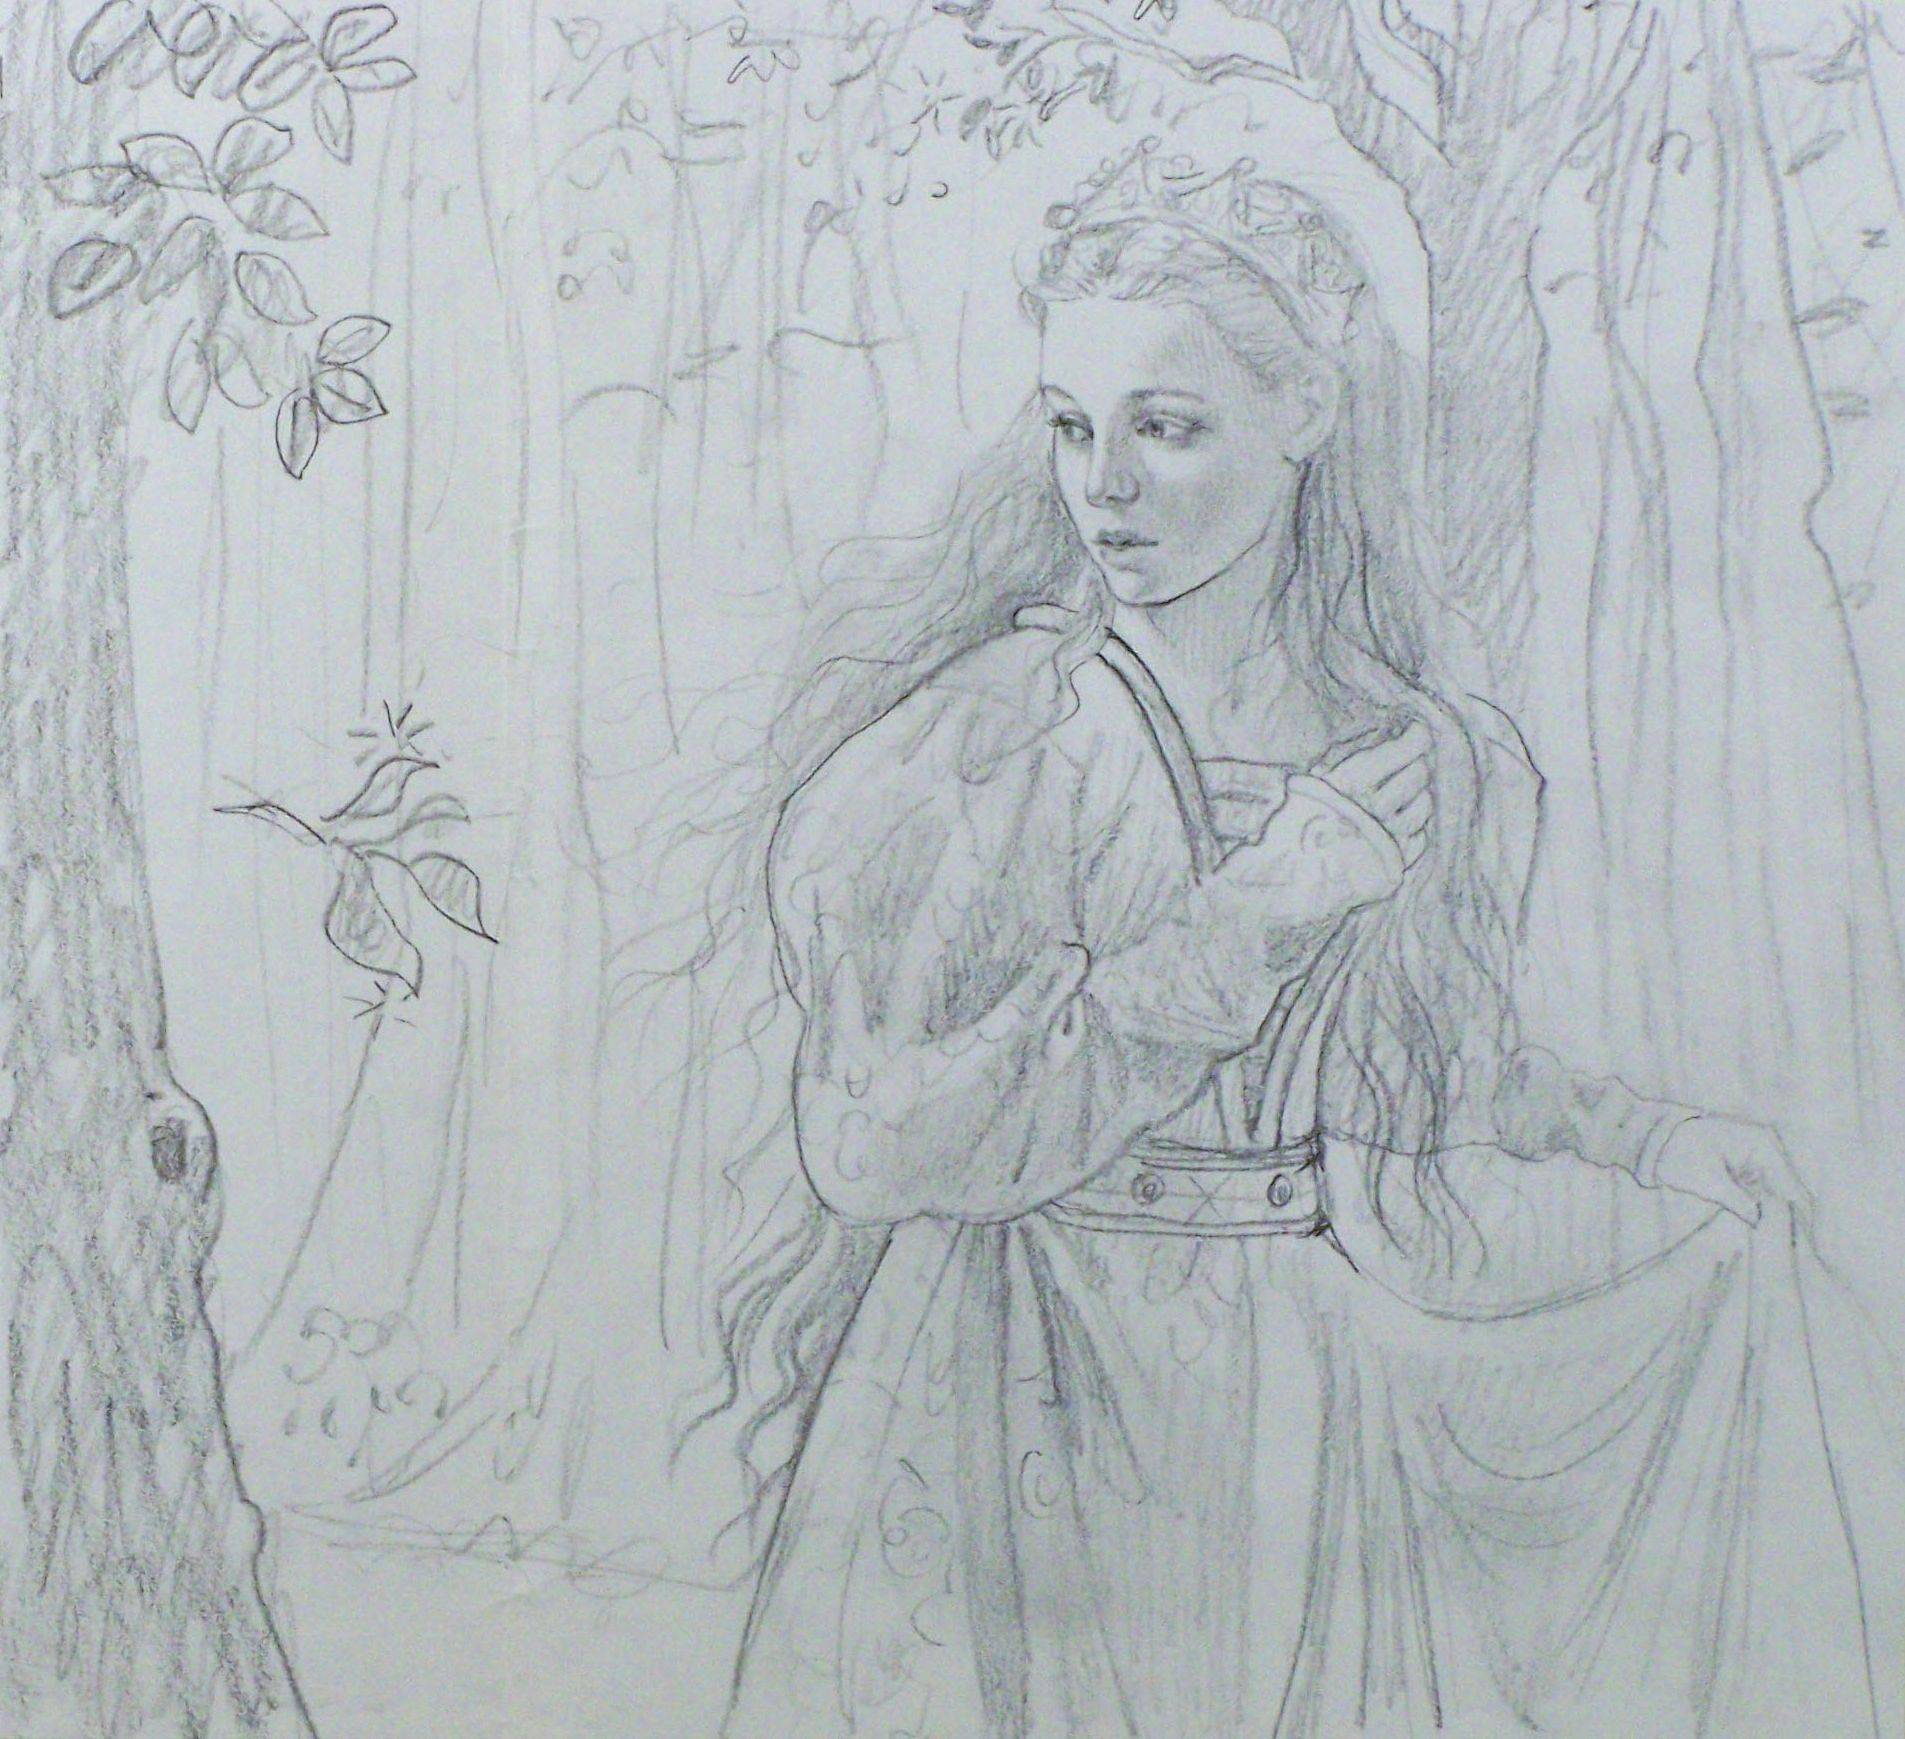 14. Ruth Sanderson, The Twelve Dancing Princesses sketch, 1990